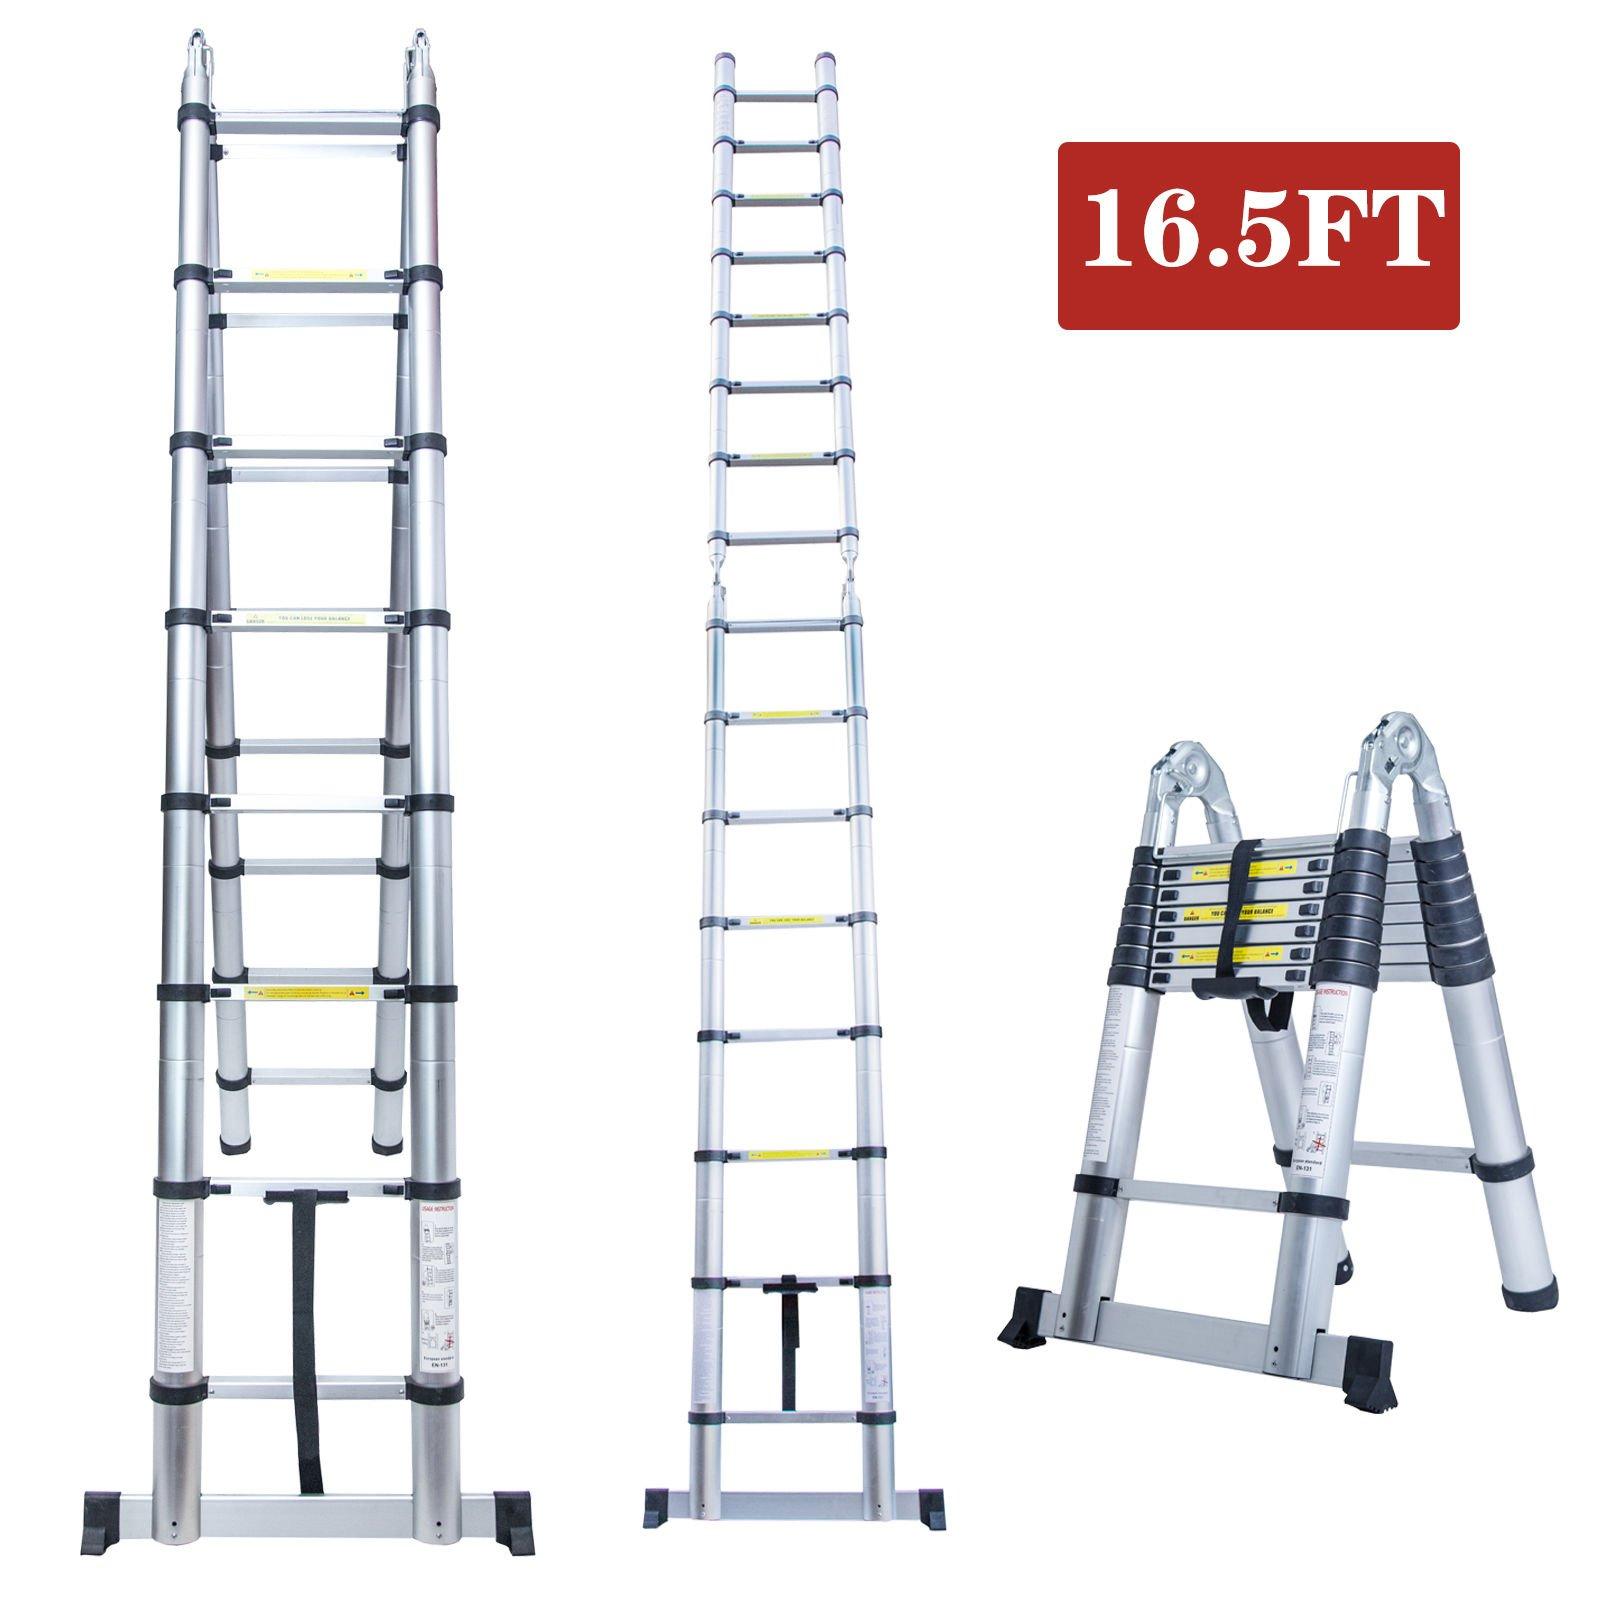 16.5FT A Frame Aluminum Multi-Purpose Folding Telescopic Telescoping Ladder Extension Foldable Portable Heavy Duty - EN131 Certified - 330 Pound Capacity